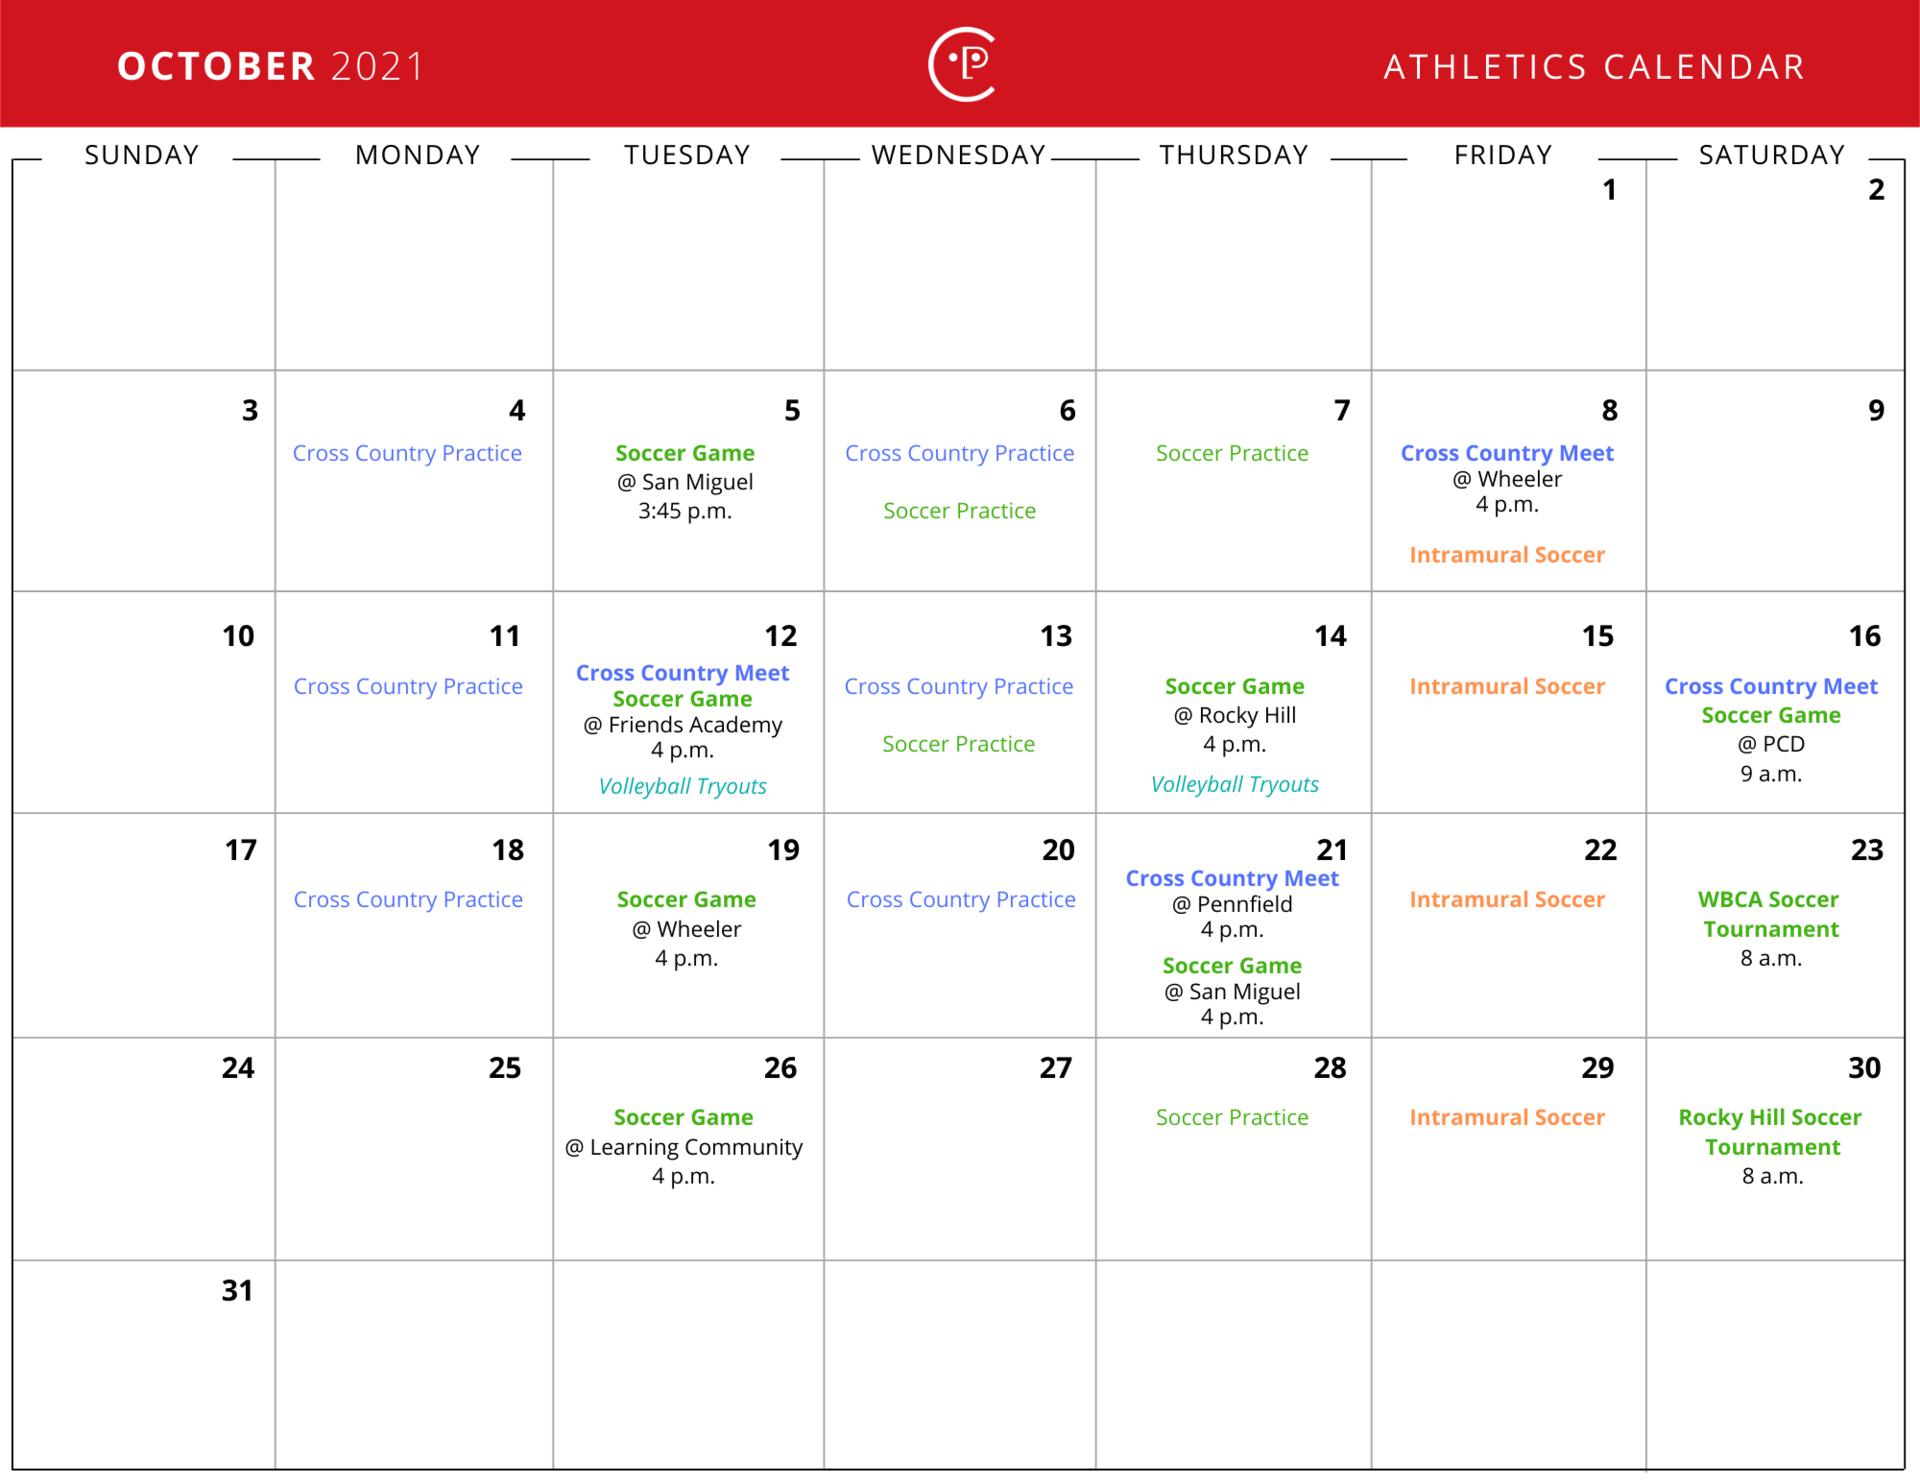 October 2021 Athletics Calendar